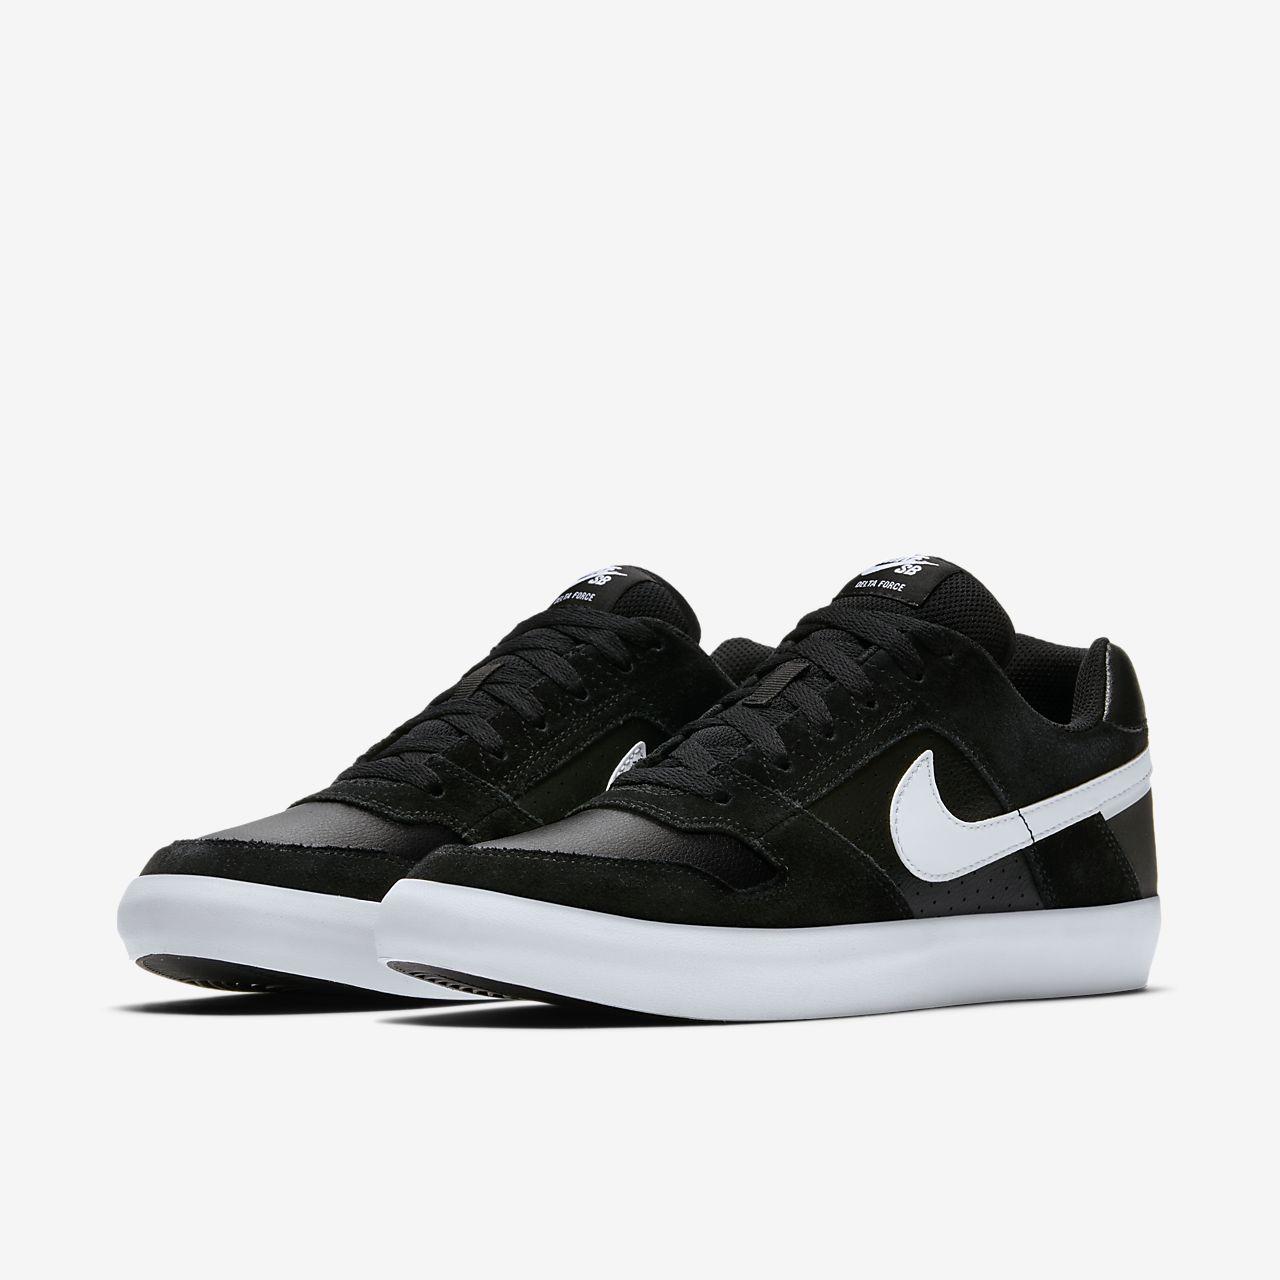 Nike Delta Force Toddler Shoes